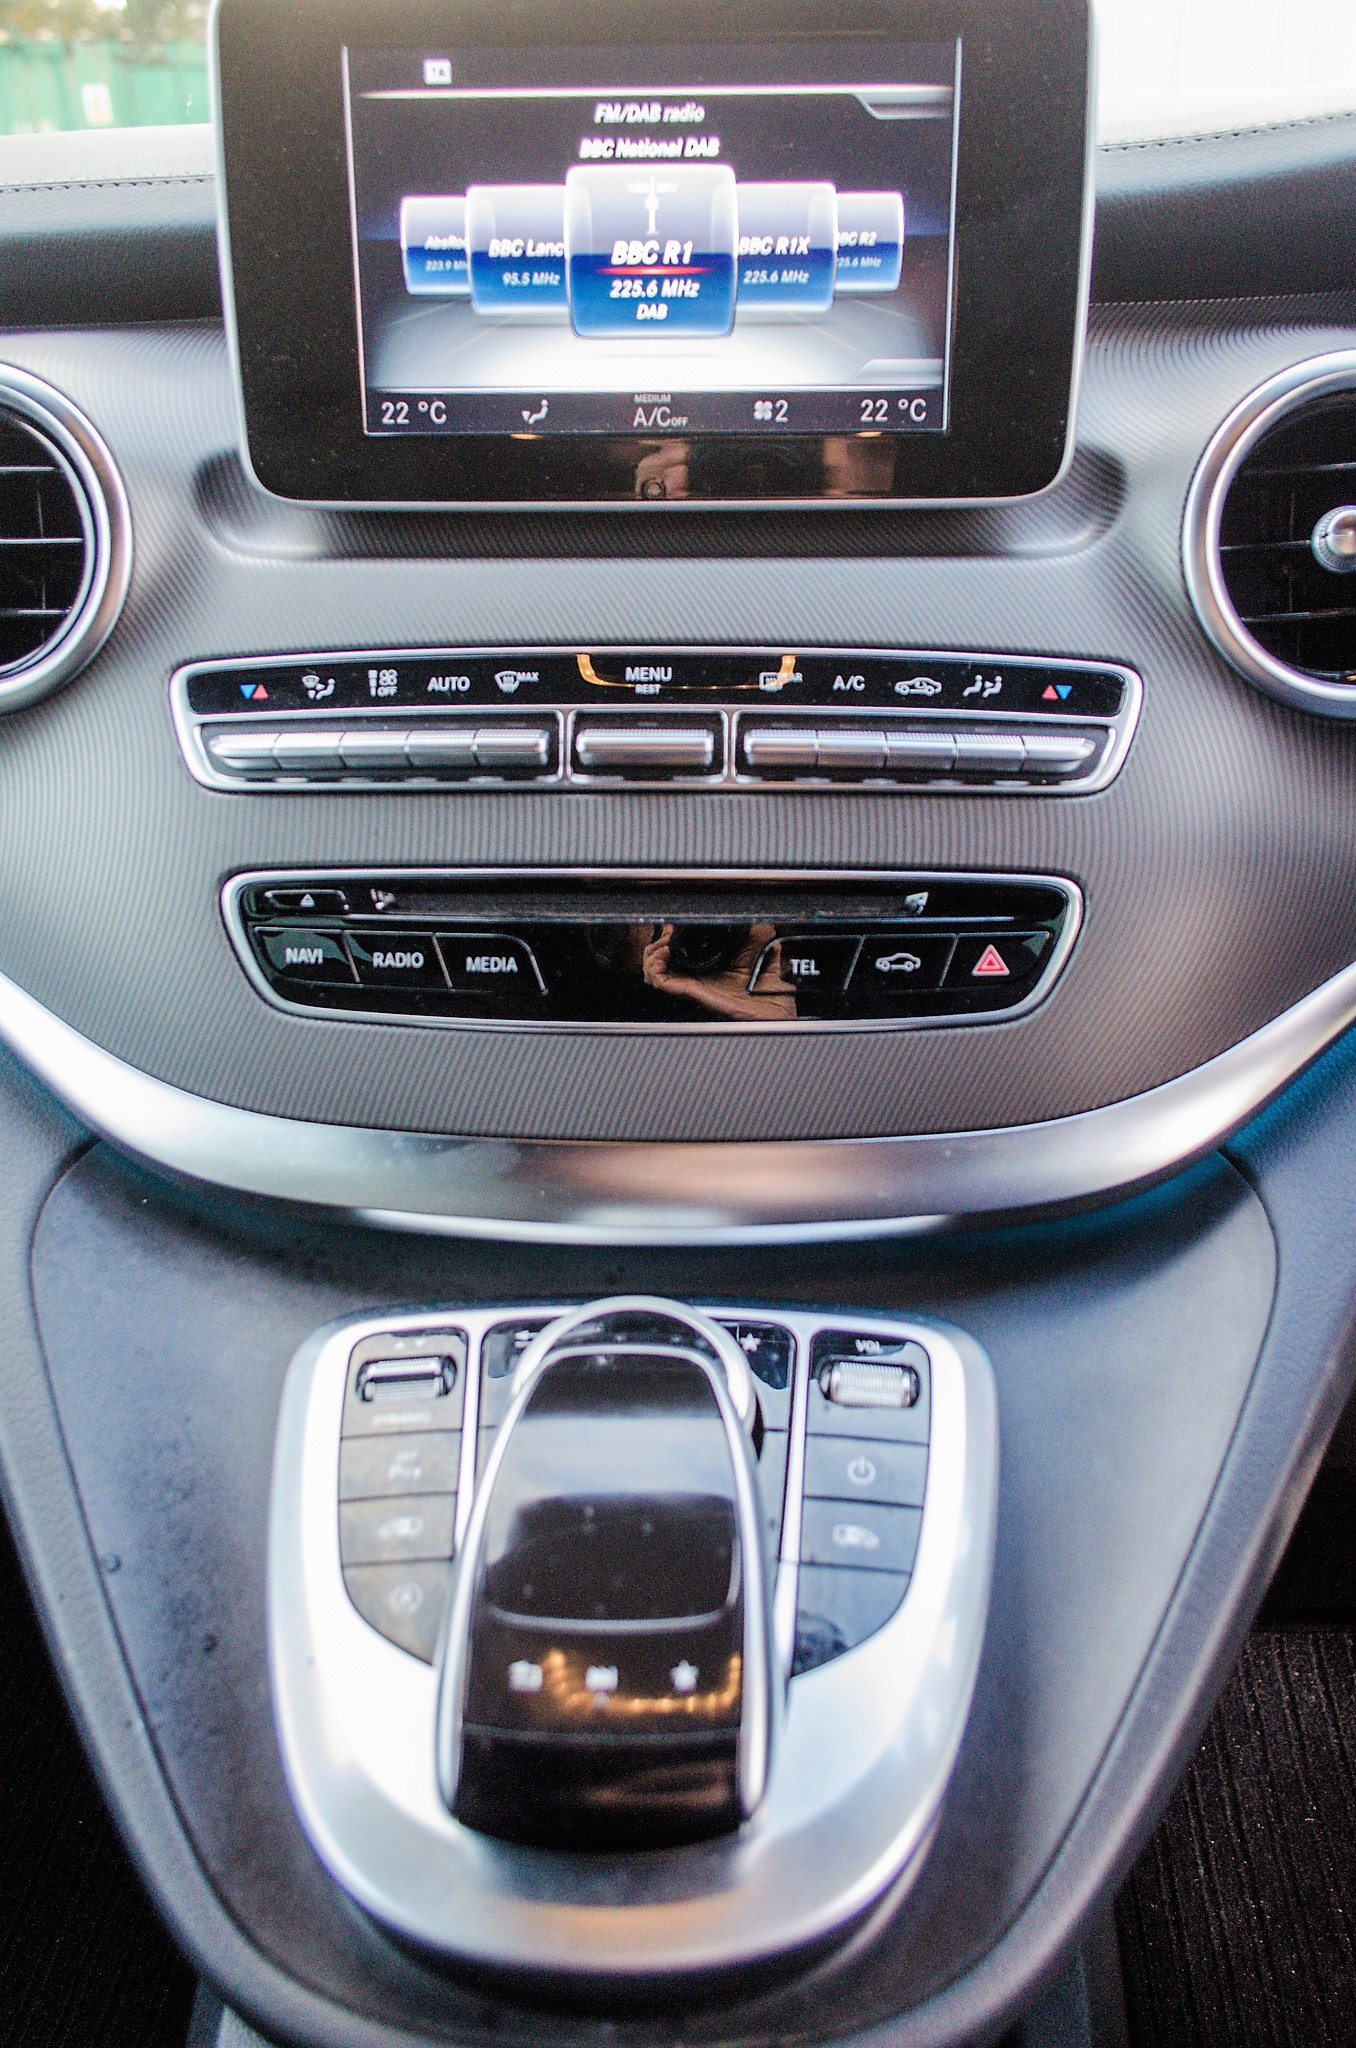 Mercedes Benz V250 Sport Bluetec XLWB auto diesel 8 seat MPV Reg No: FY68 JTO Date of First - Image 25 of 27